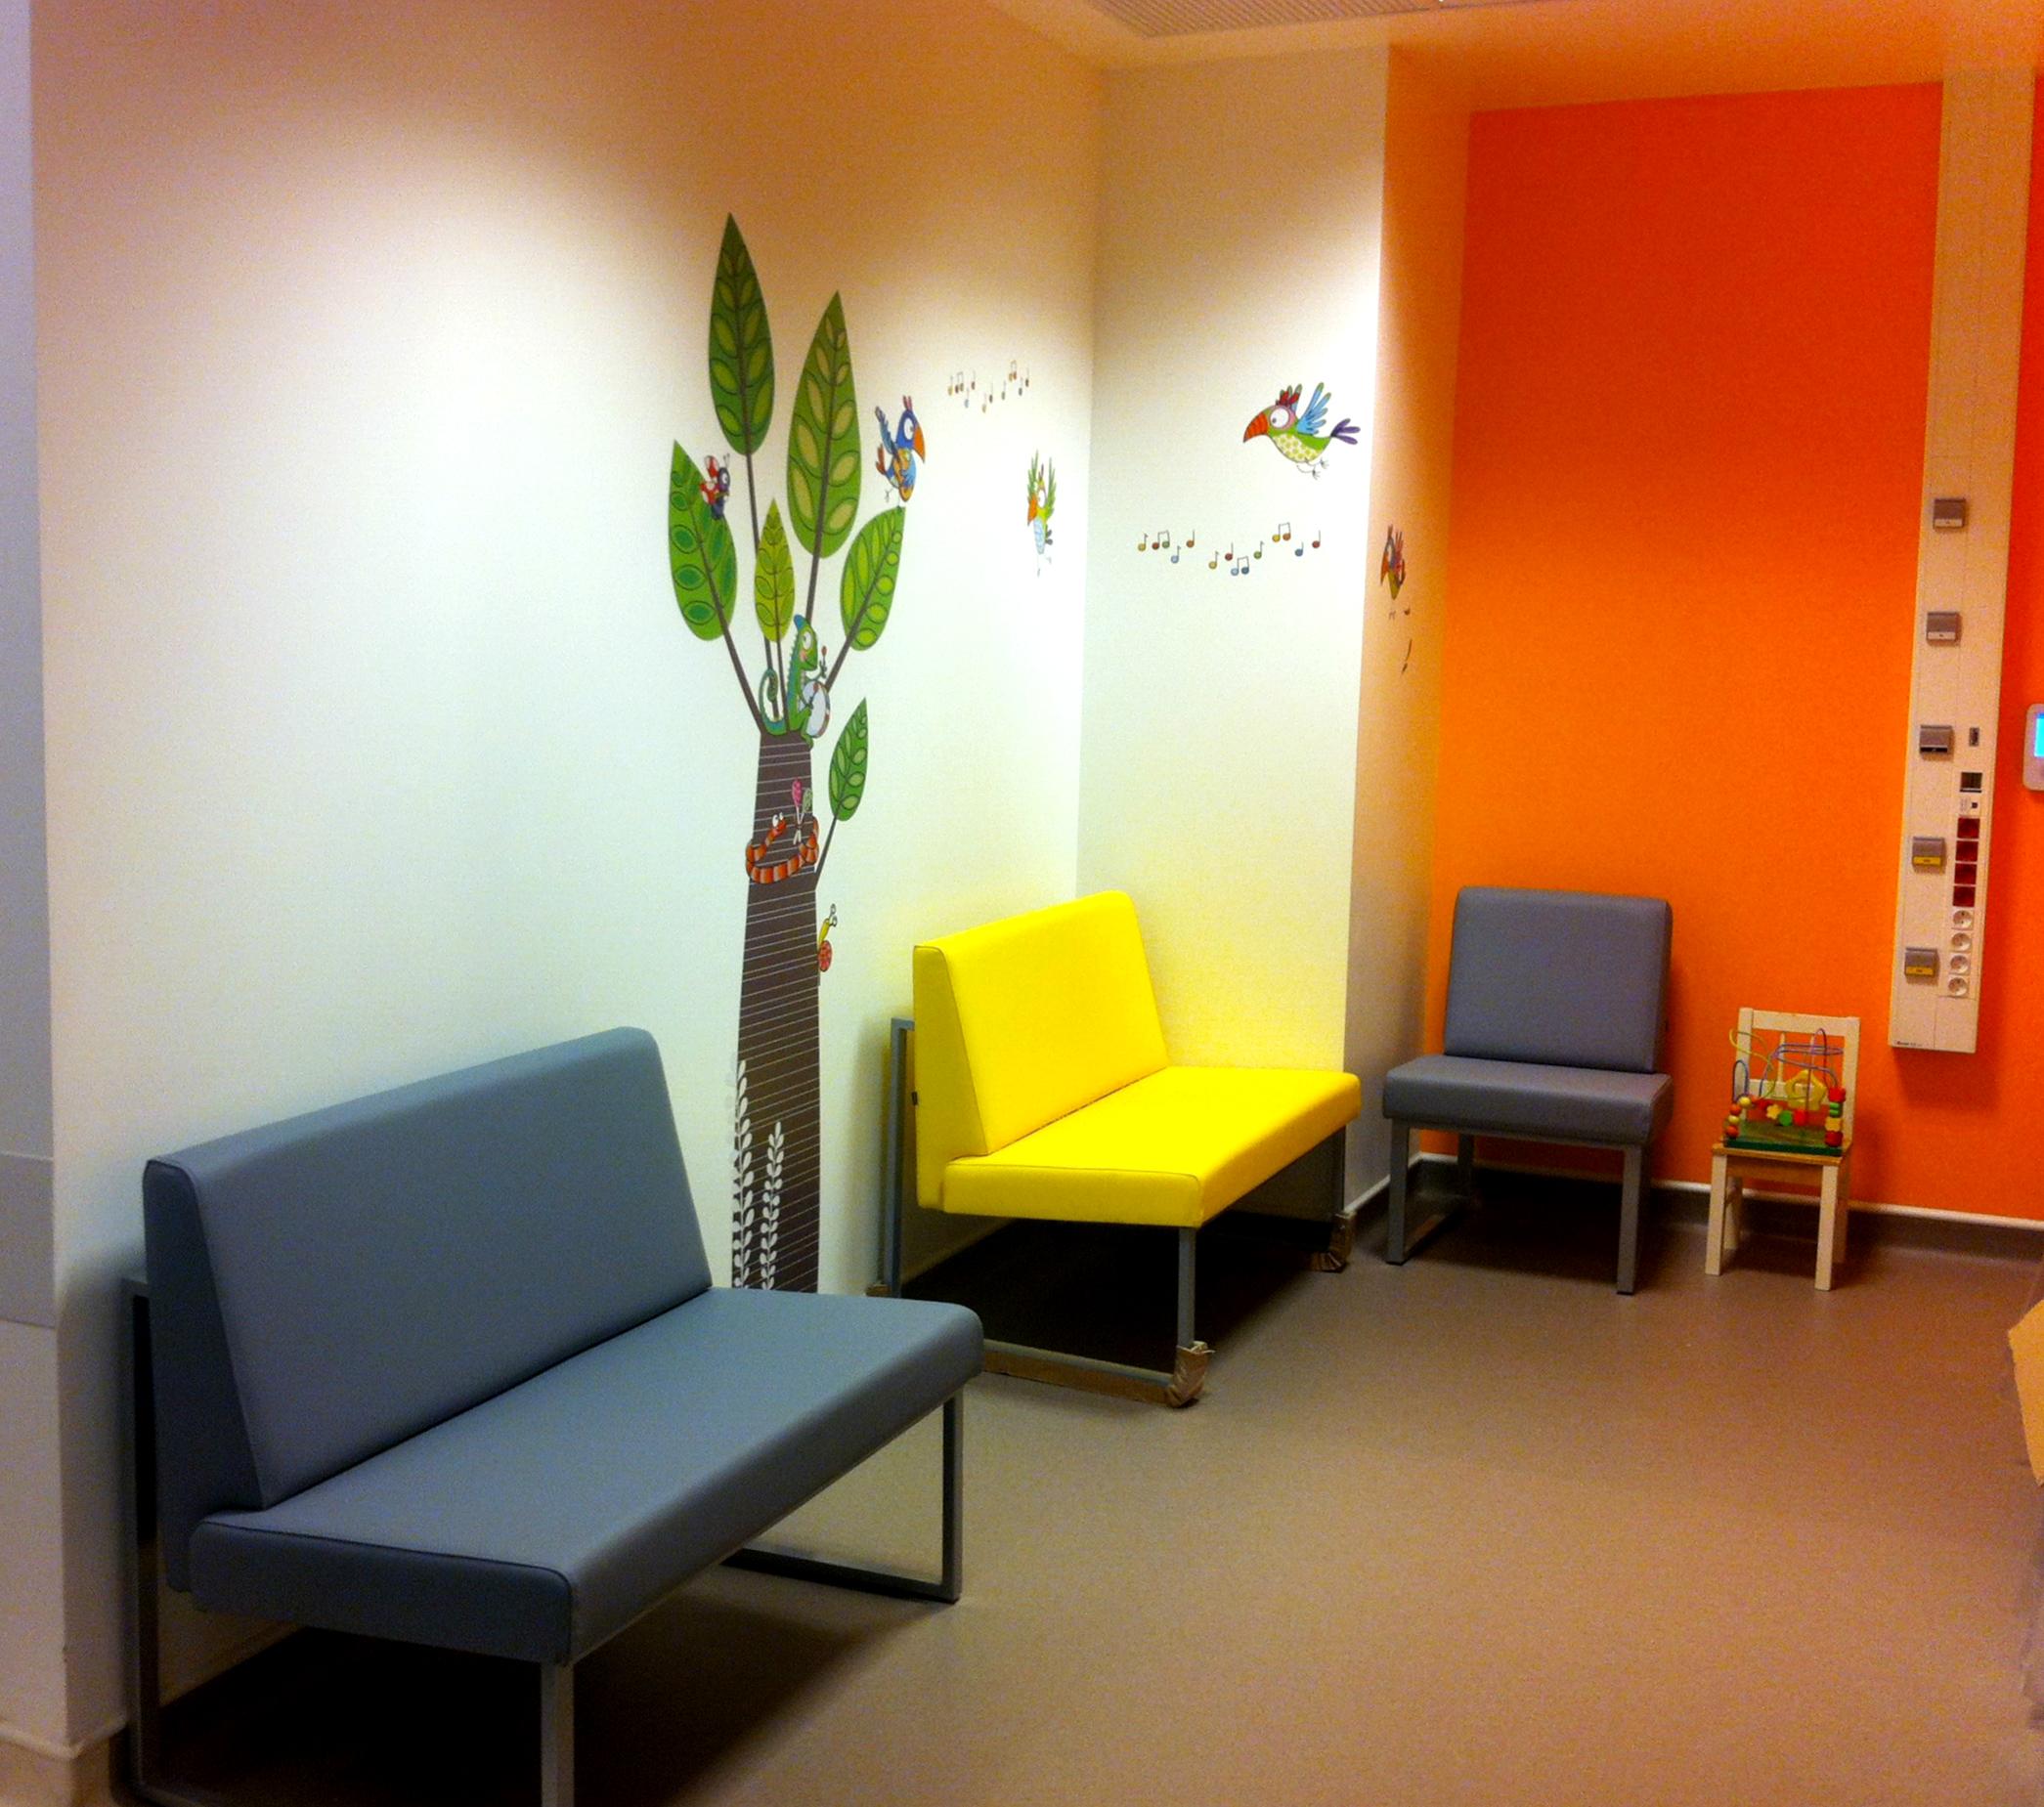 salle d'attente chirurgie urgences